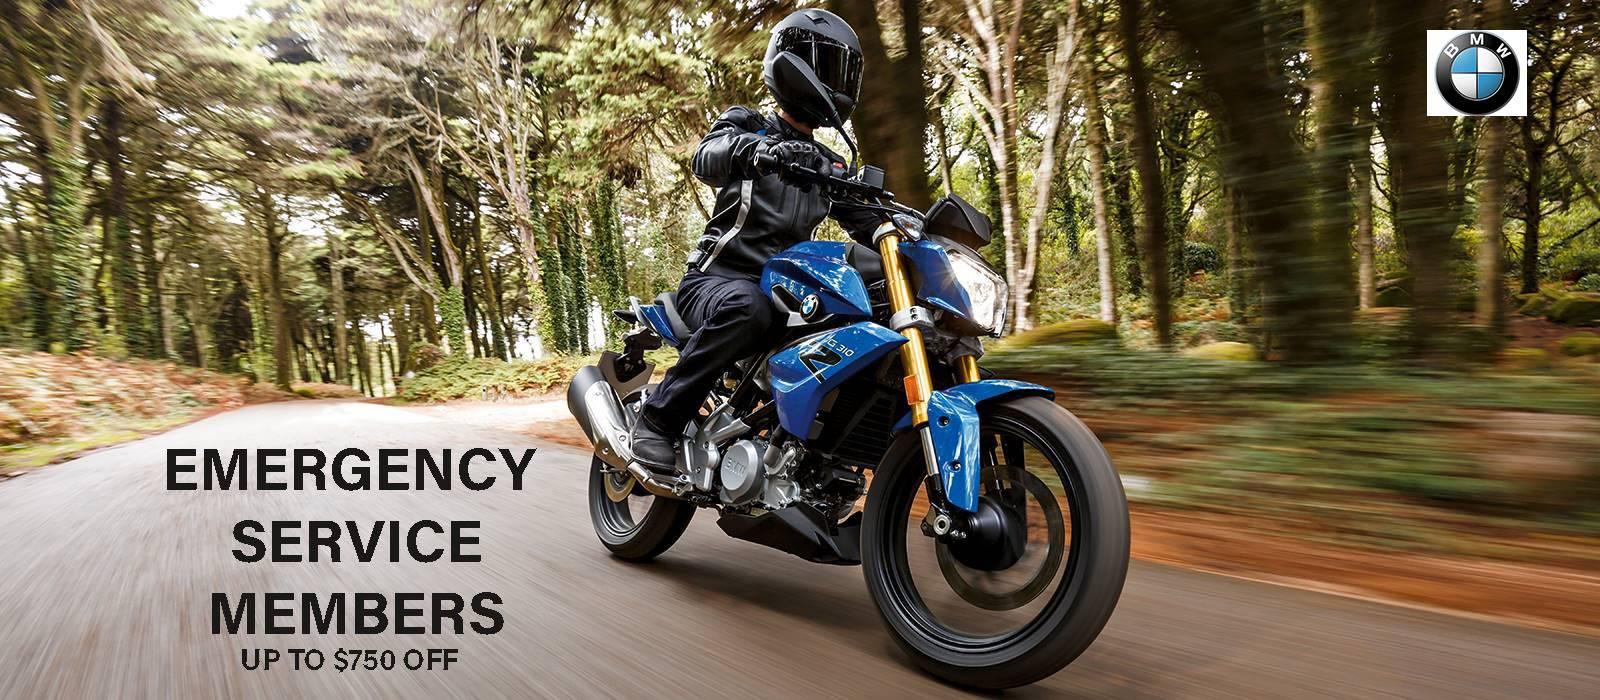 BMW - Emergency Services Program